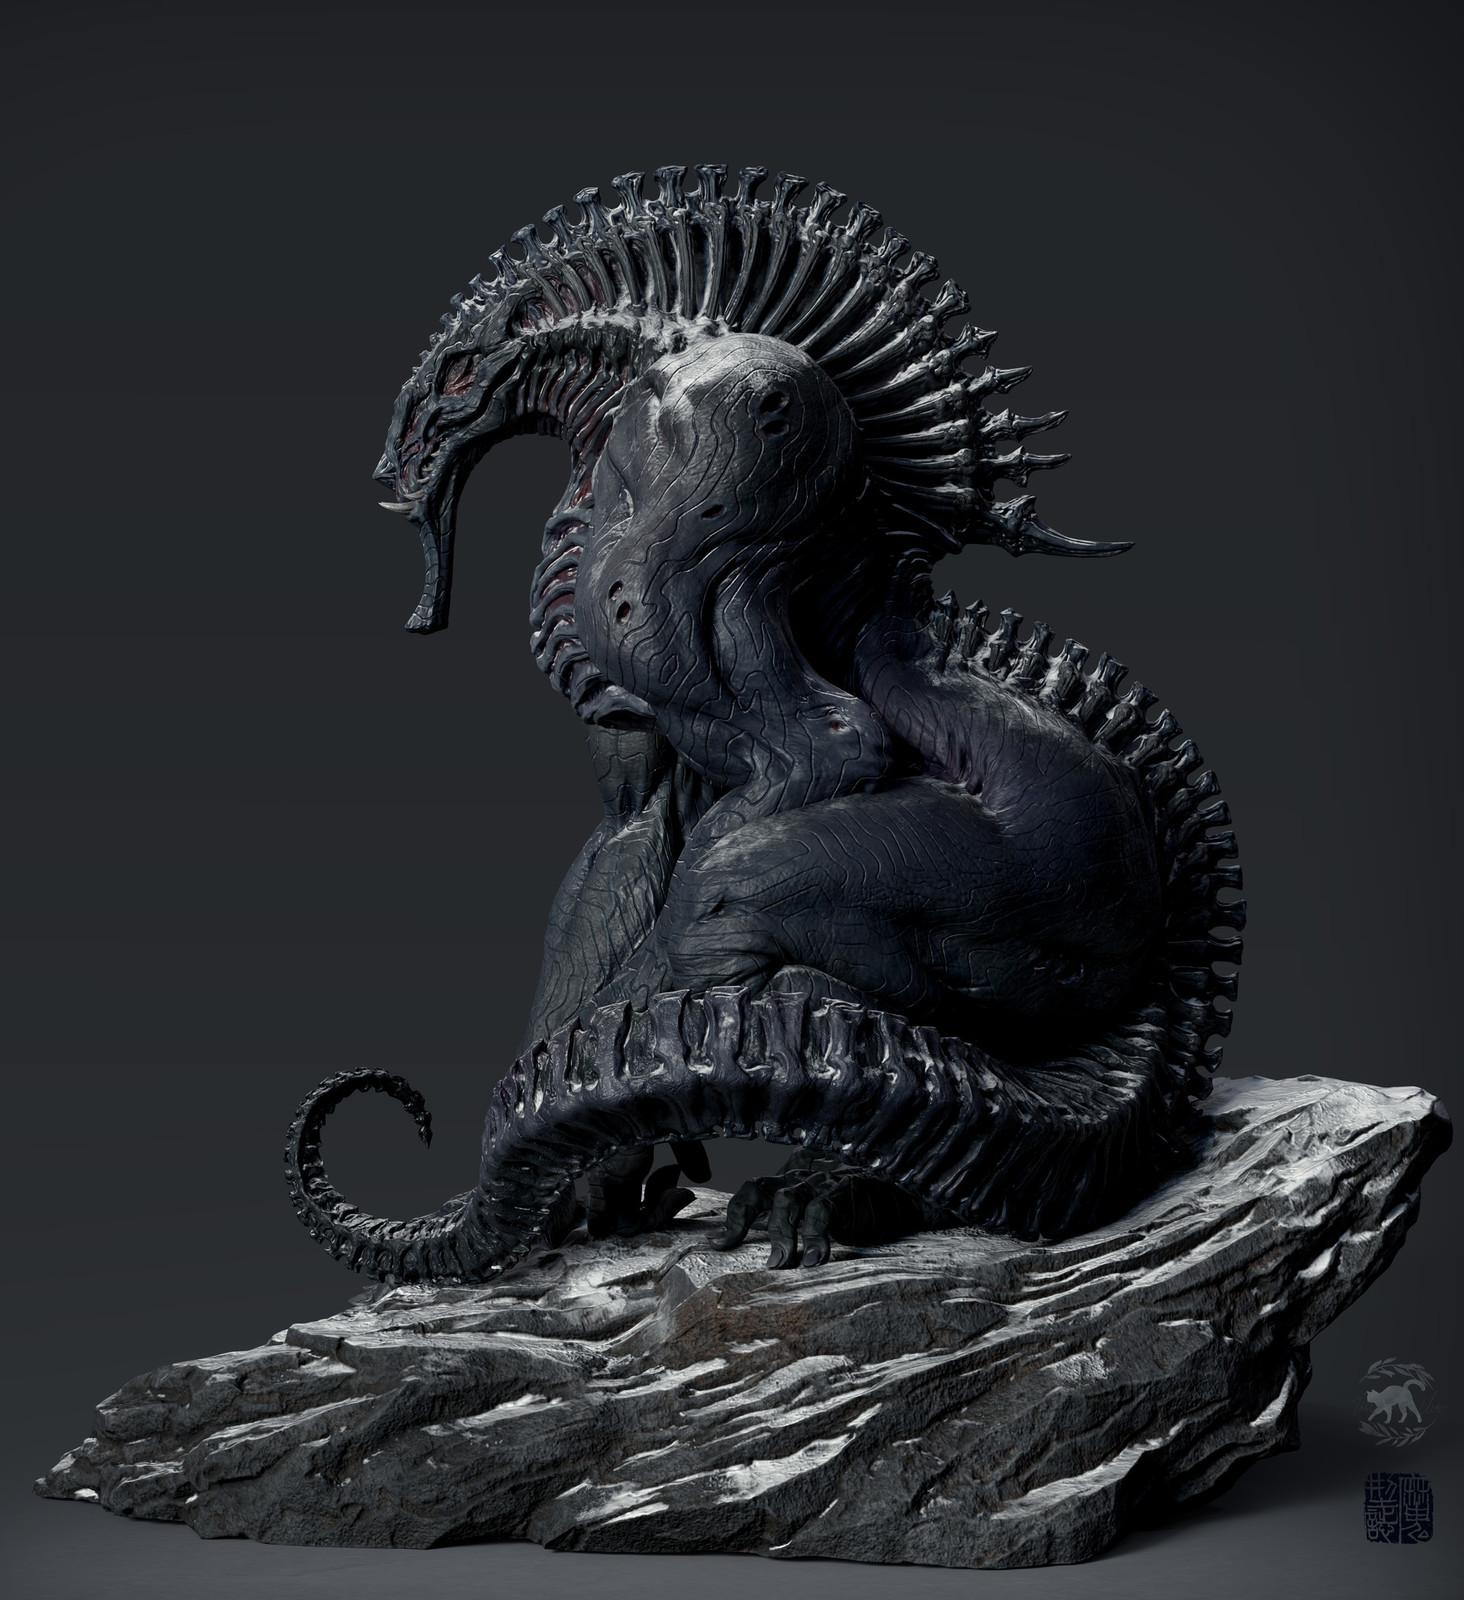 3D model by Xinhang C   https://www.artstation.com/artwork/WOE5J